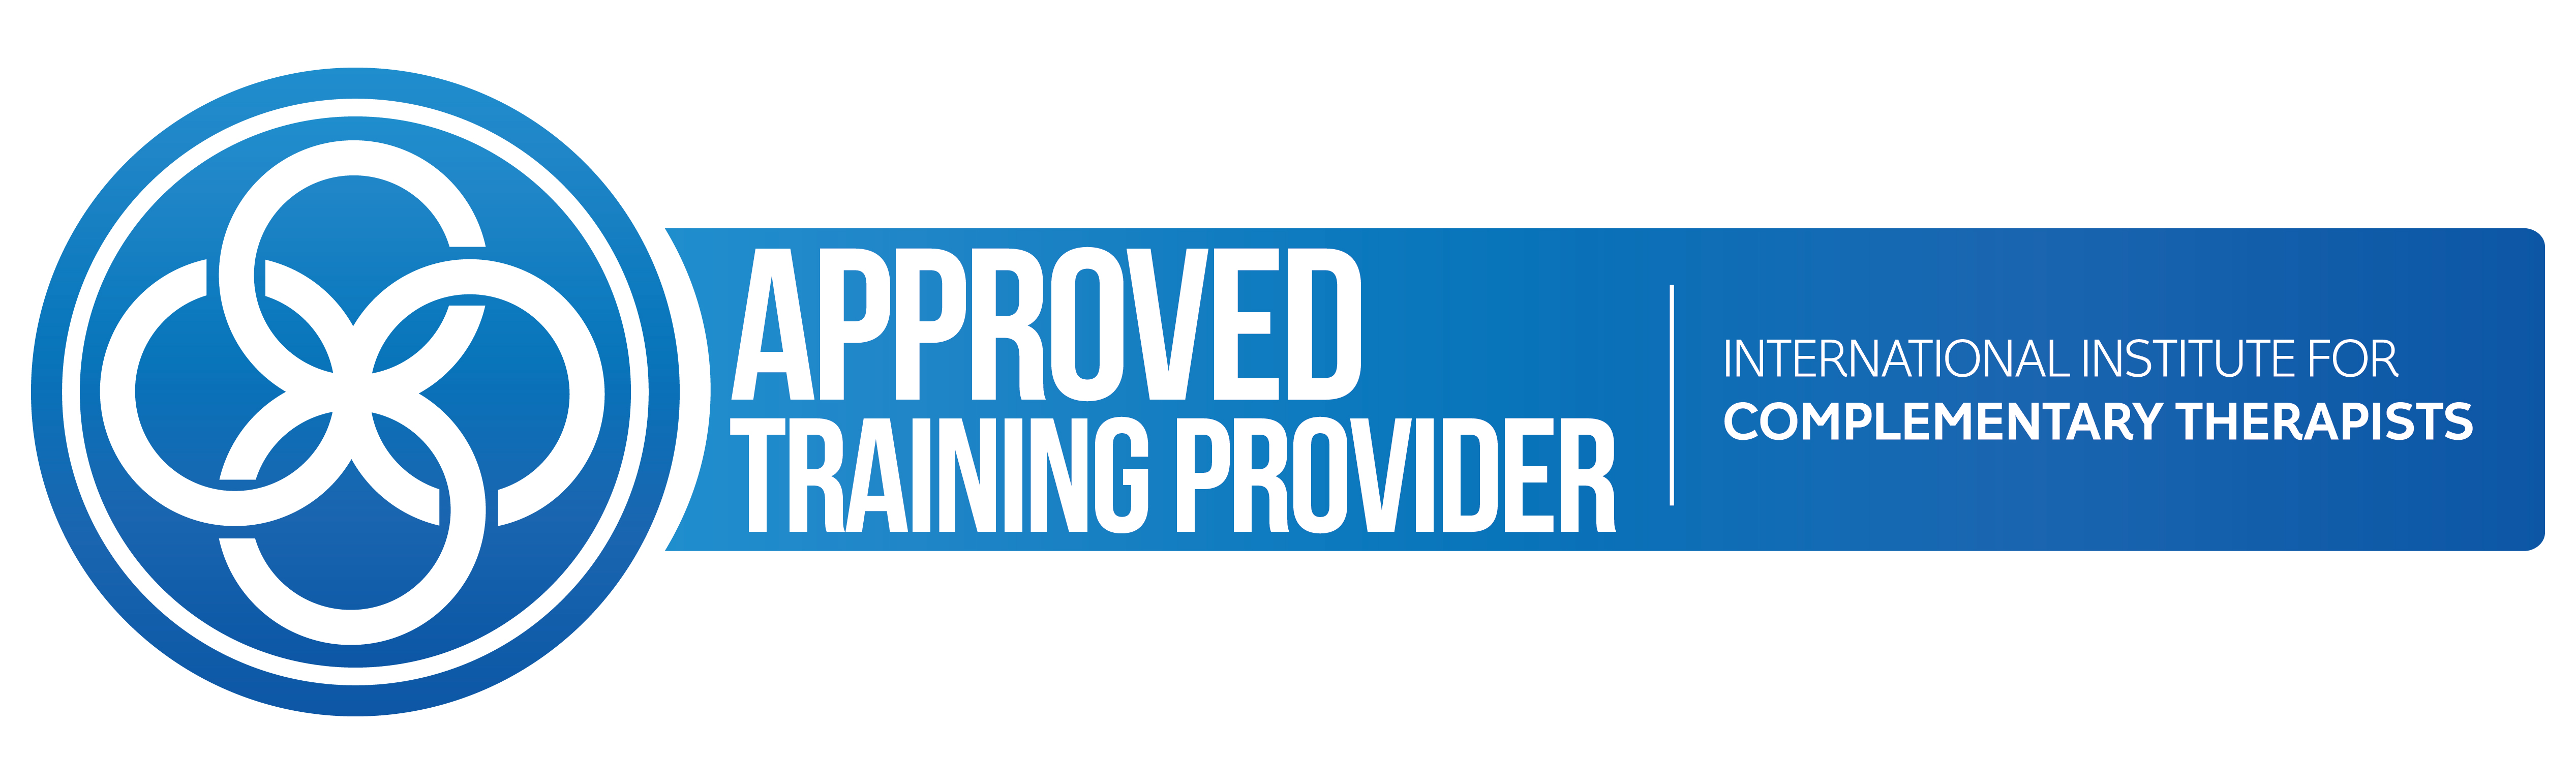 IICT Training Provider Logo